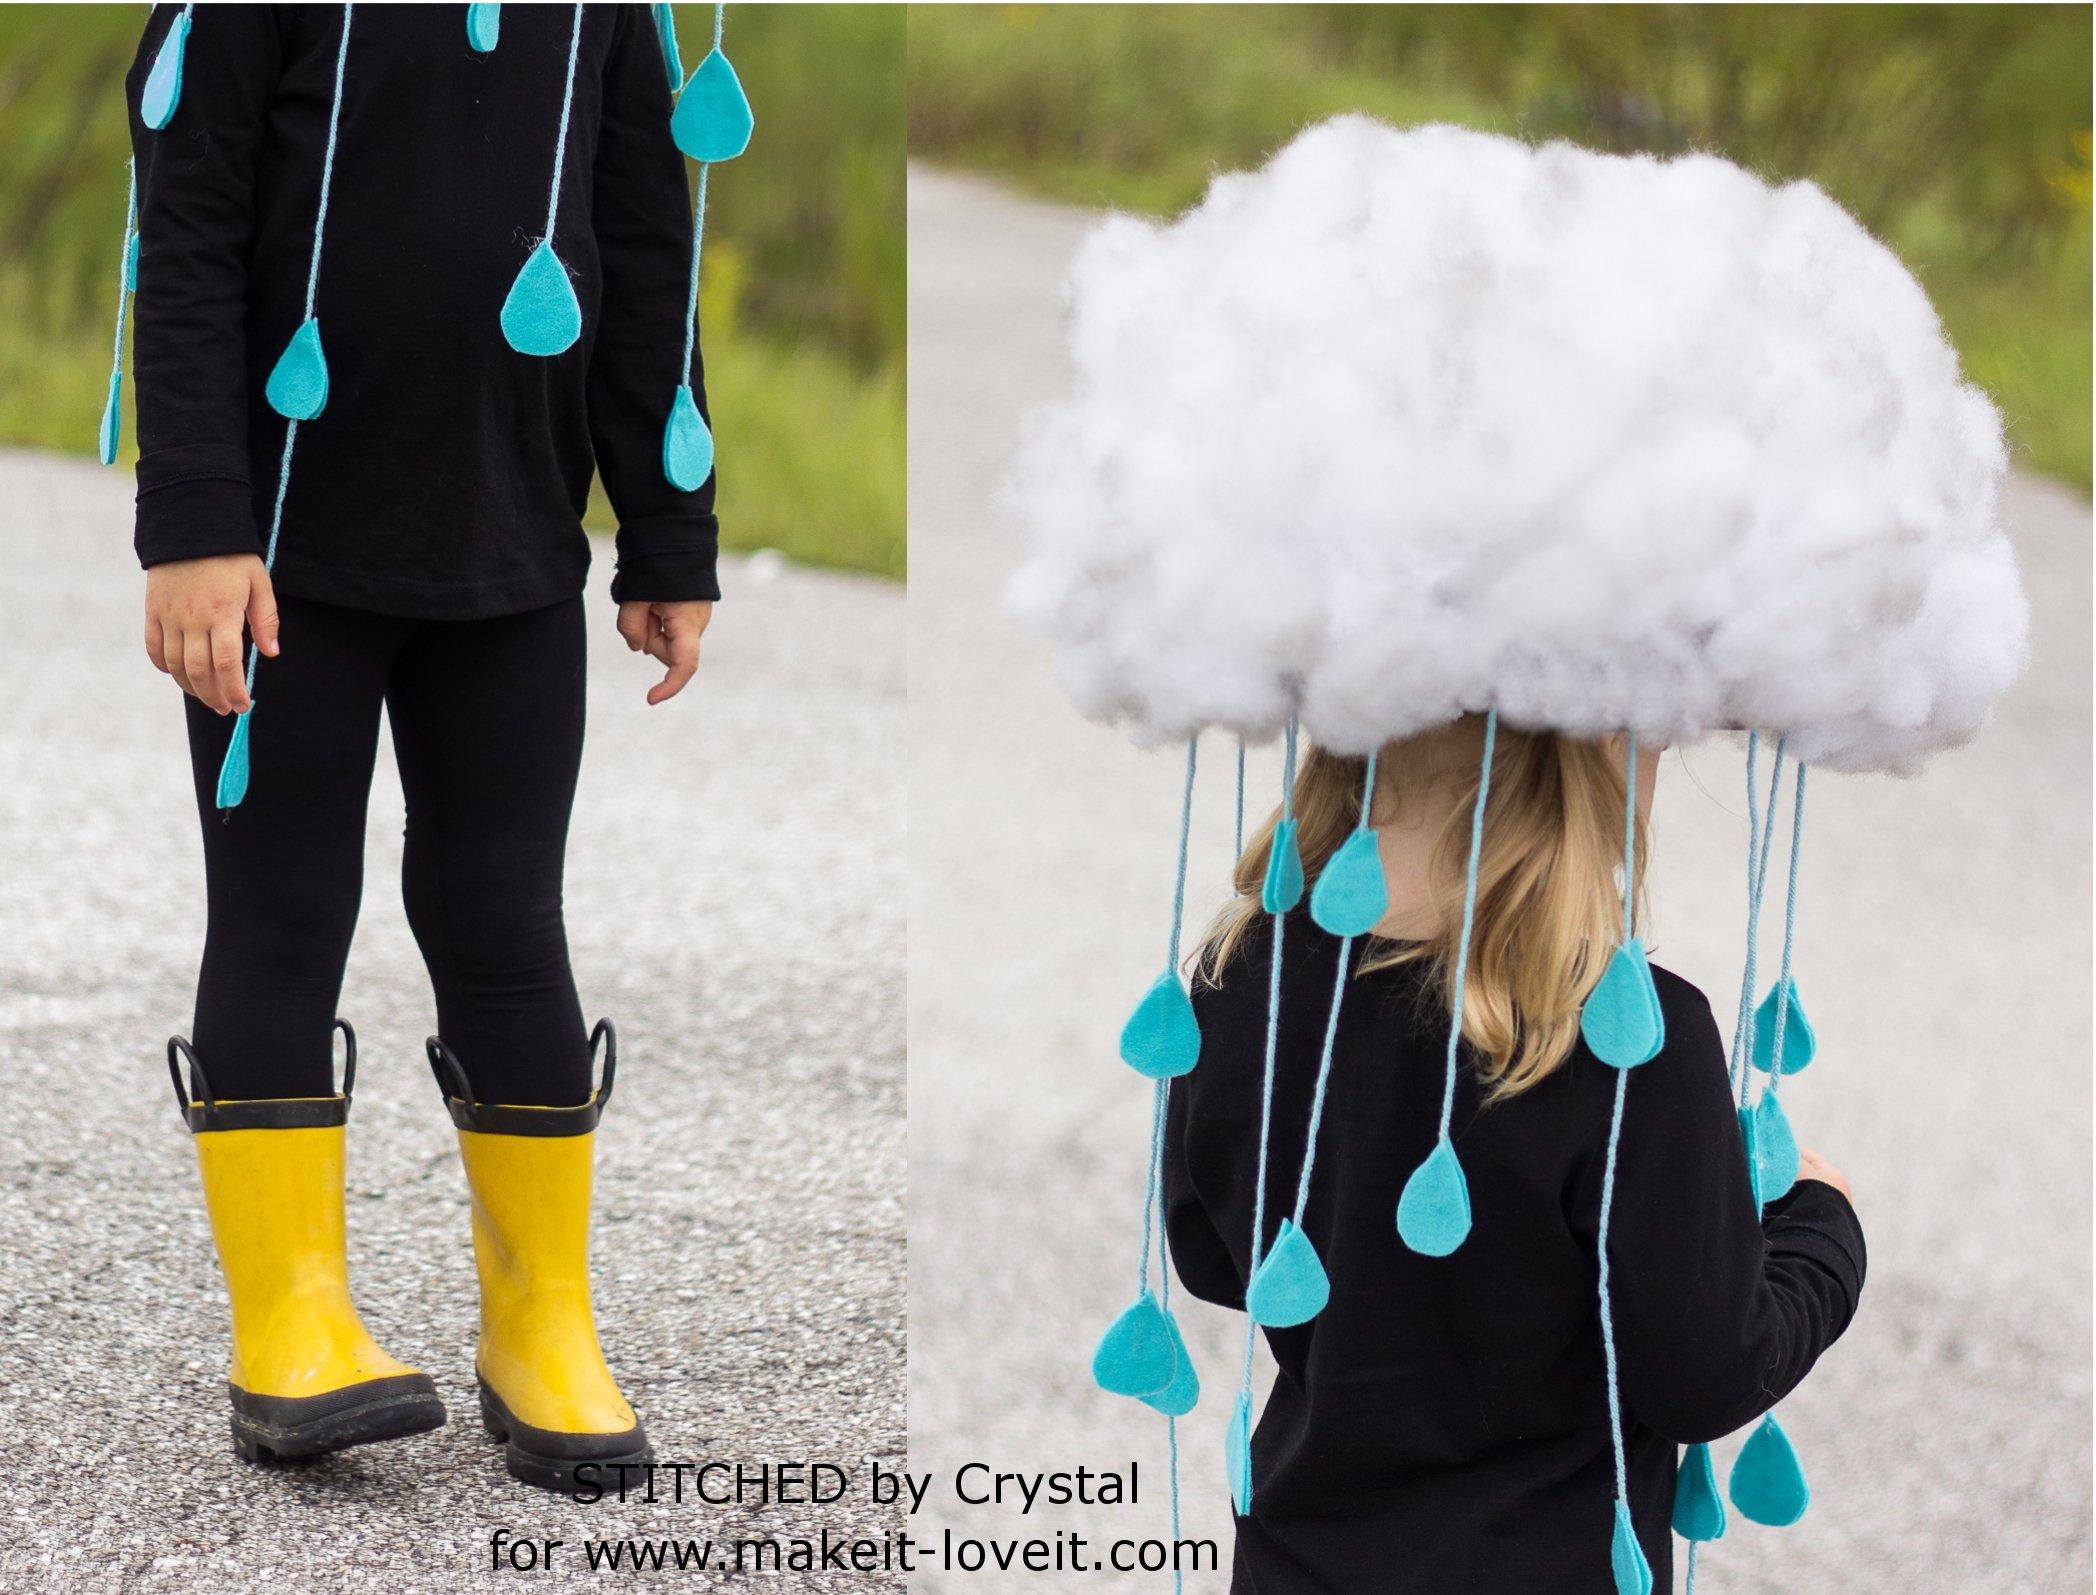 Make a quick & easy RAIN CLOUD COSTUME...for all ages! | via www.makeit-loveit.com